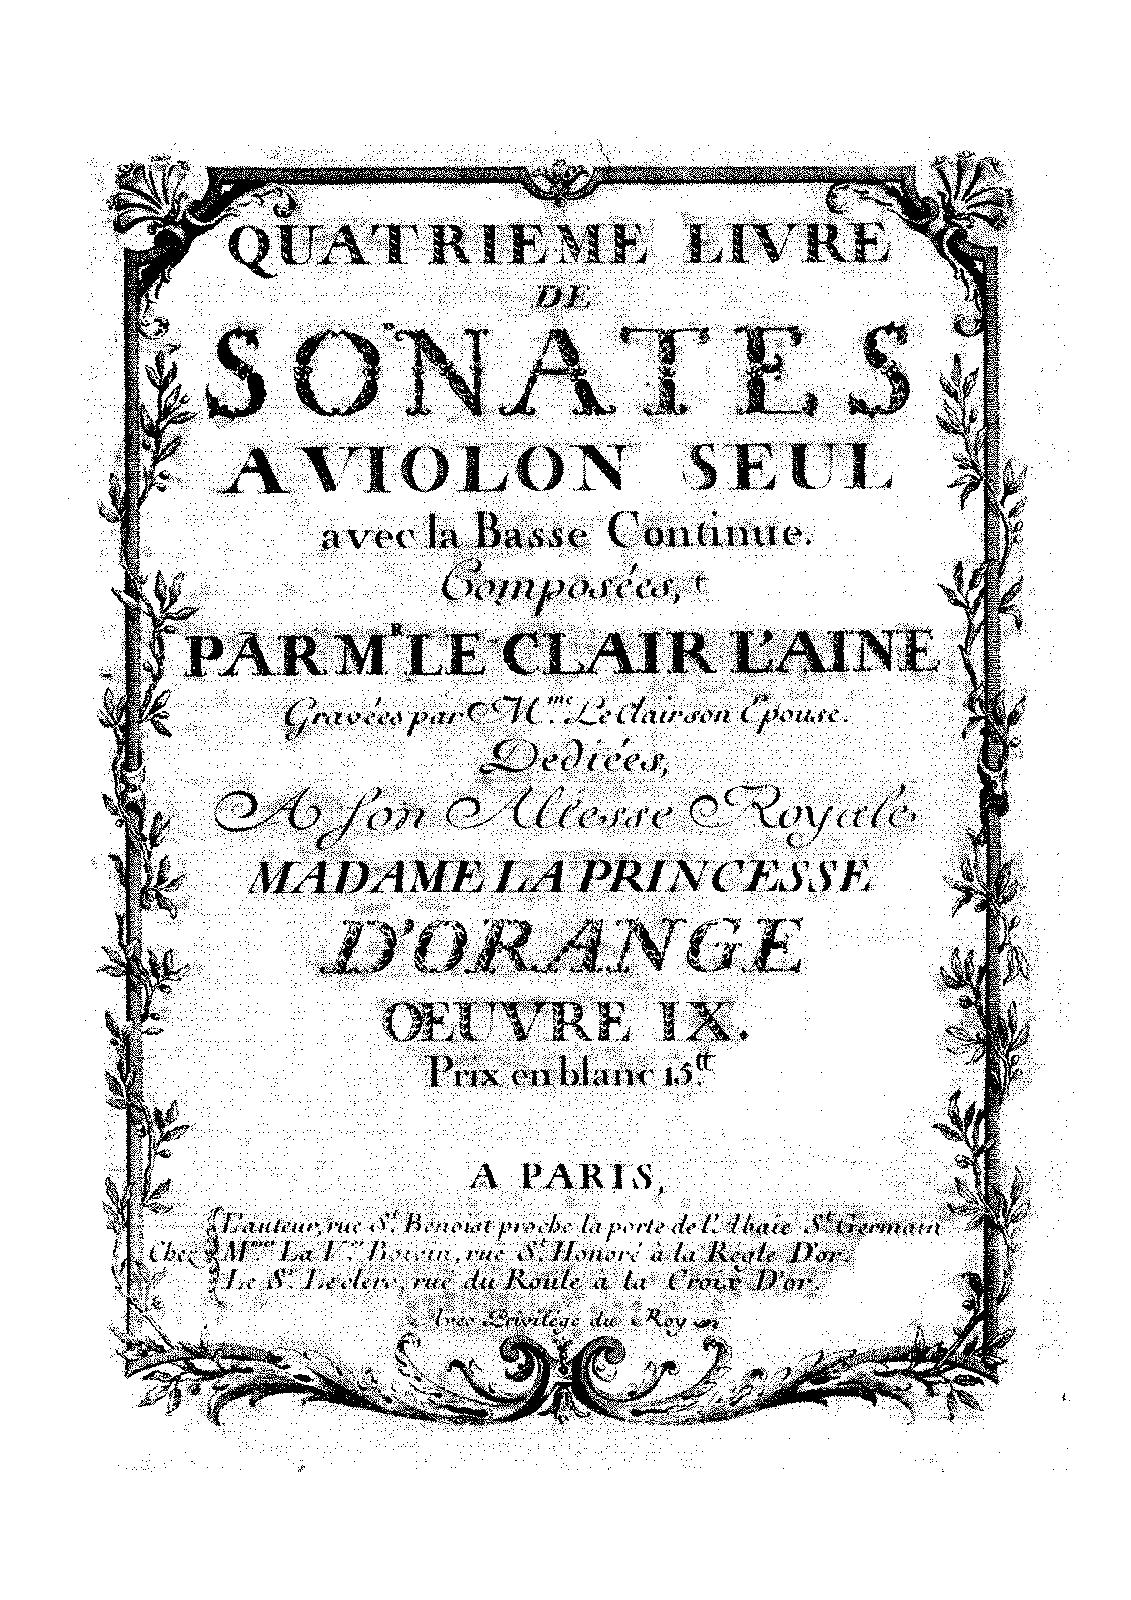 12 violin sonatas op 9 leclair jean marie imslp petrucci